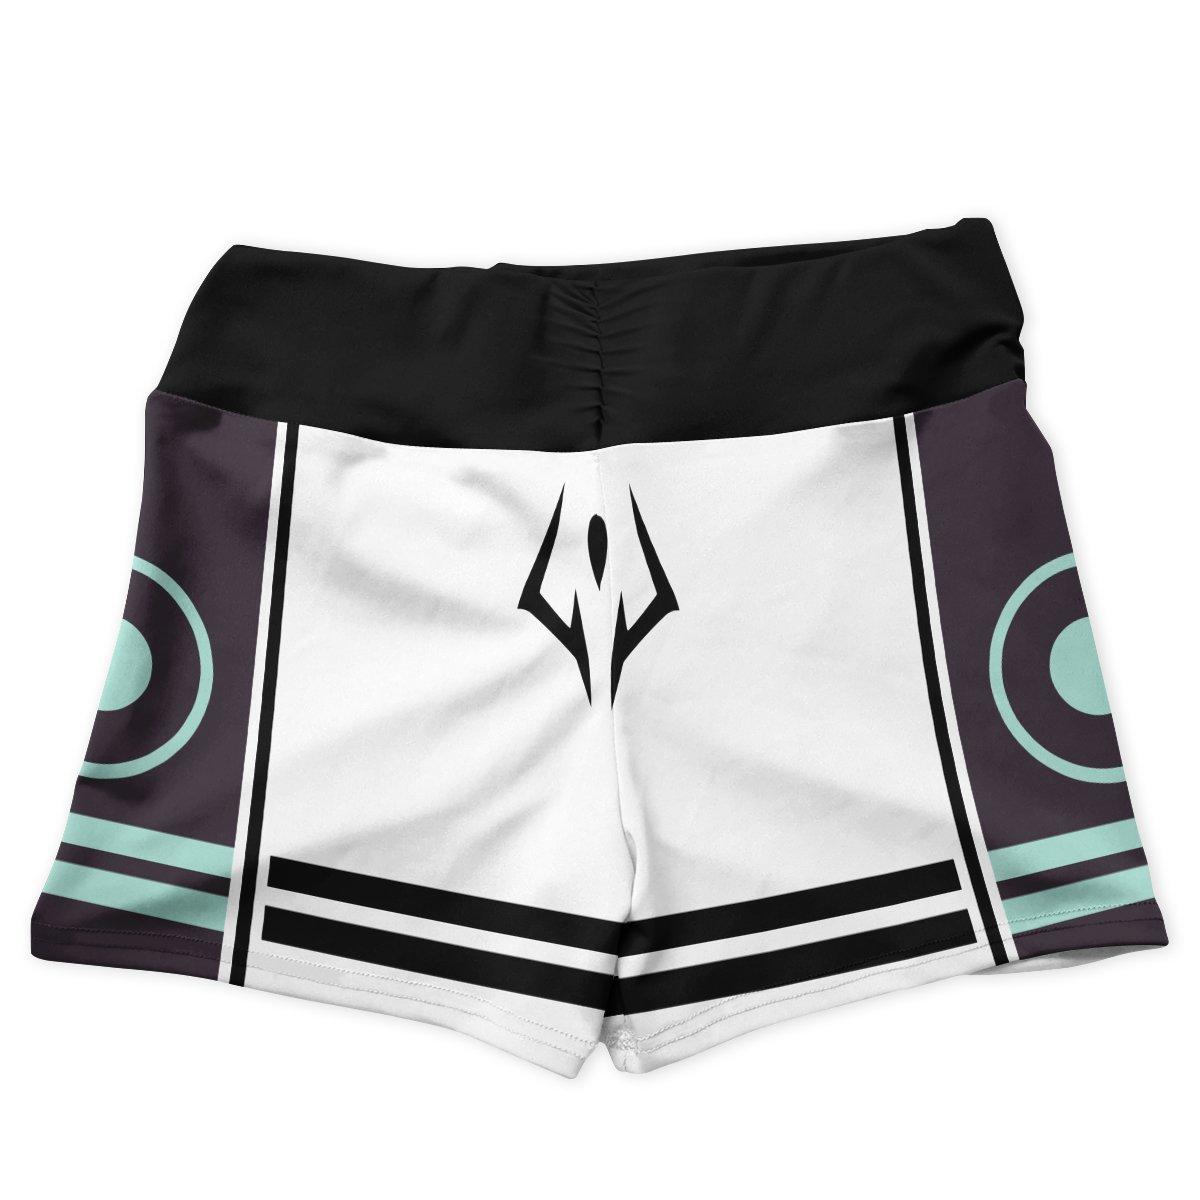 legend sukuna active wear set 534272 - Anime Swimsuits